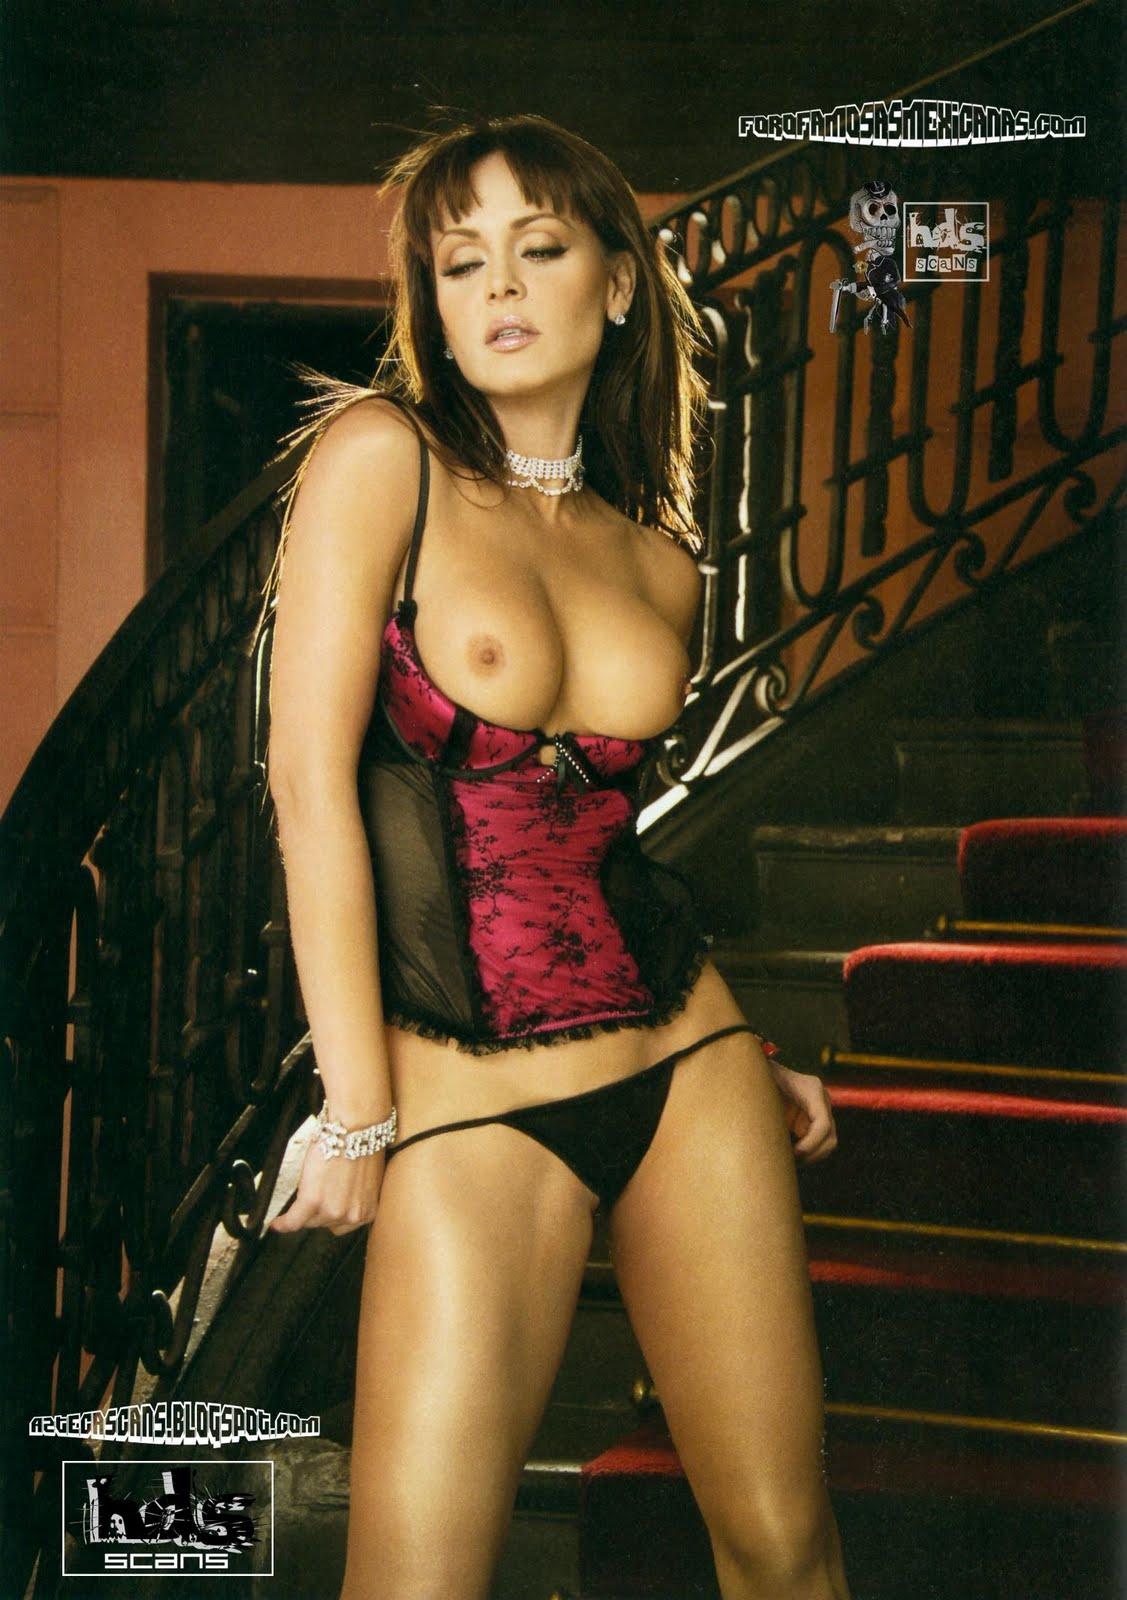 Grabriela spanic nude pics h extremo